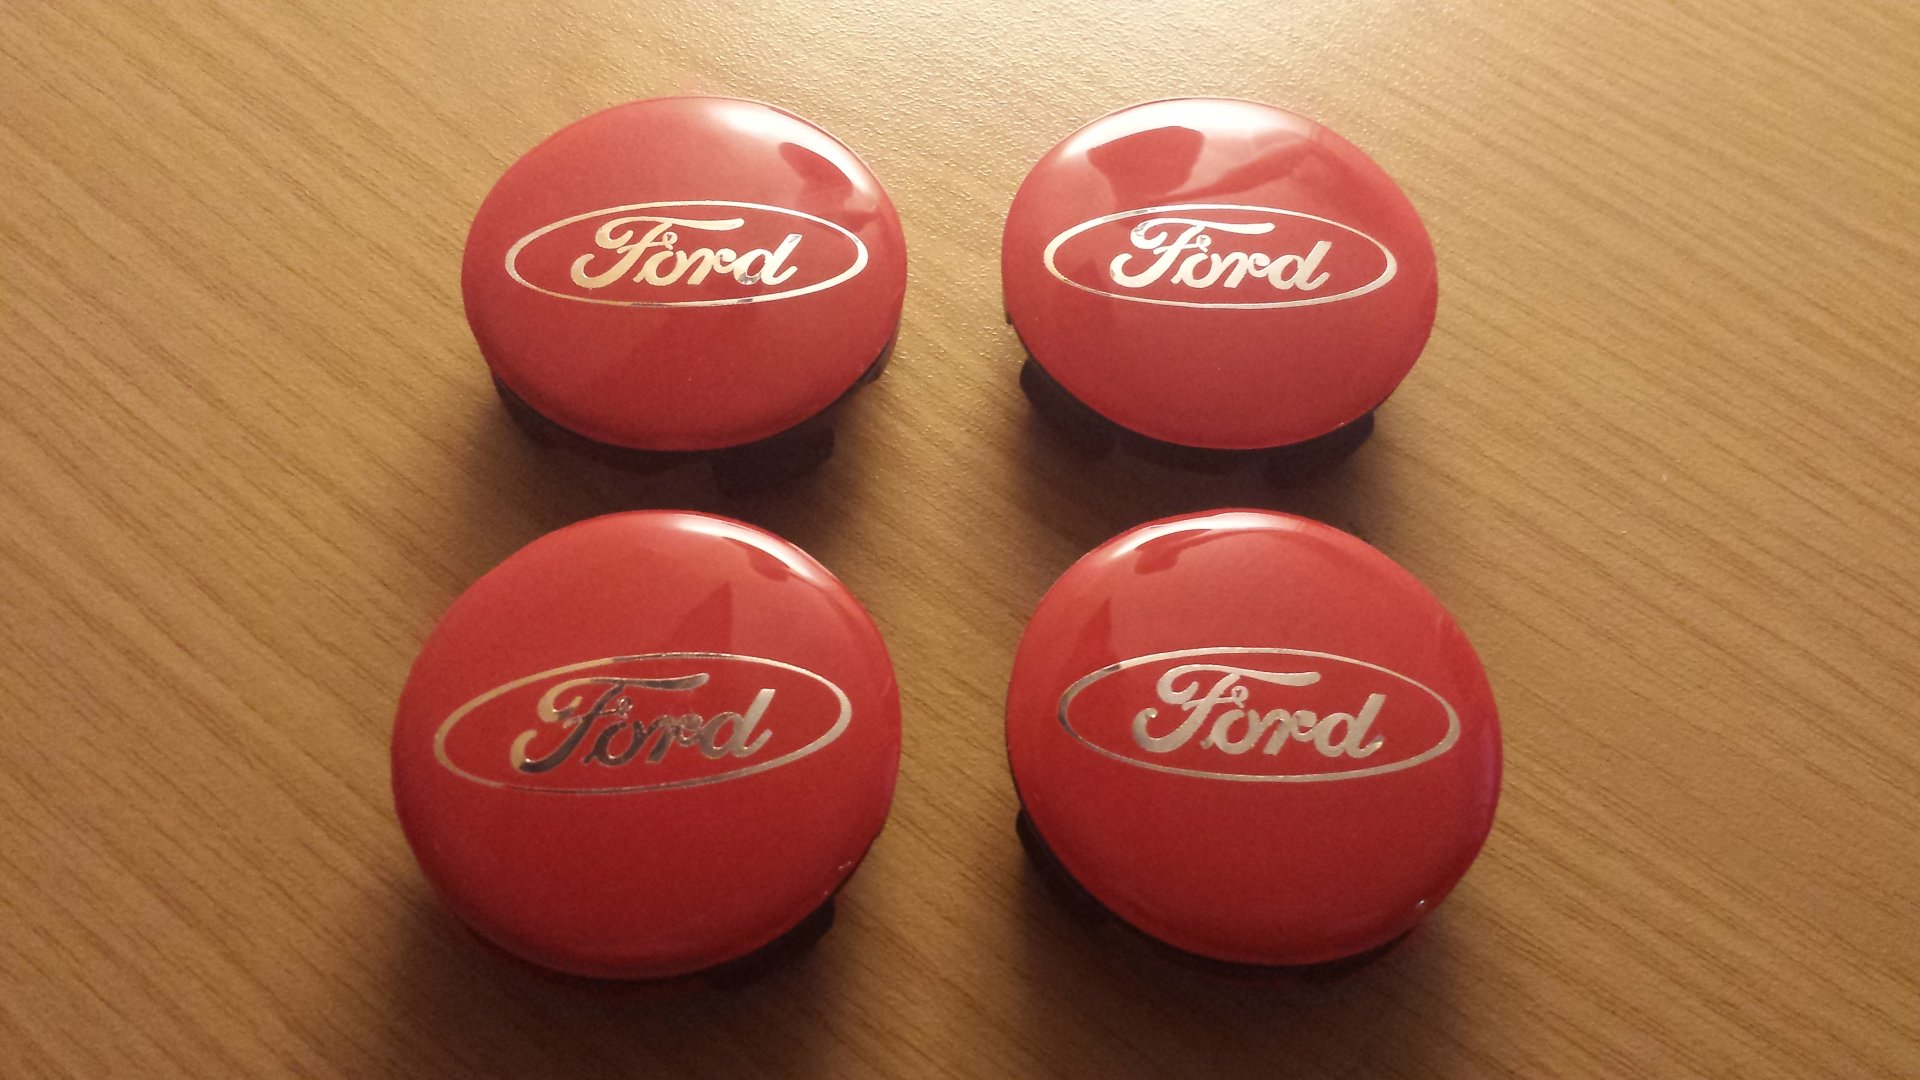 Ford Fiesta VII (2018-09-24) - Ford-Emblem Gel Badges - Gel Overlays an Nabendeckel Rot (4x).jpg